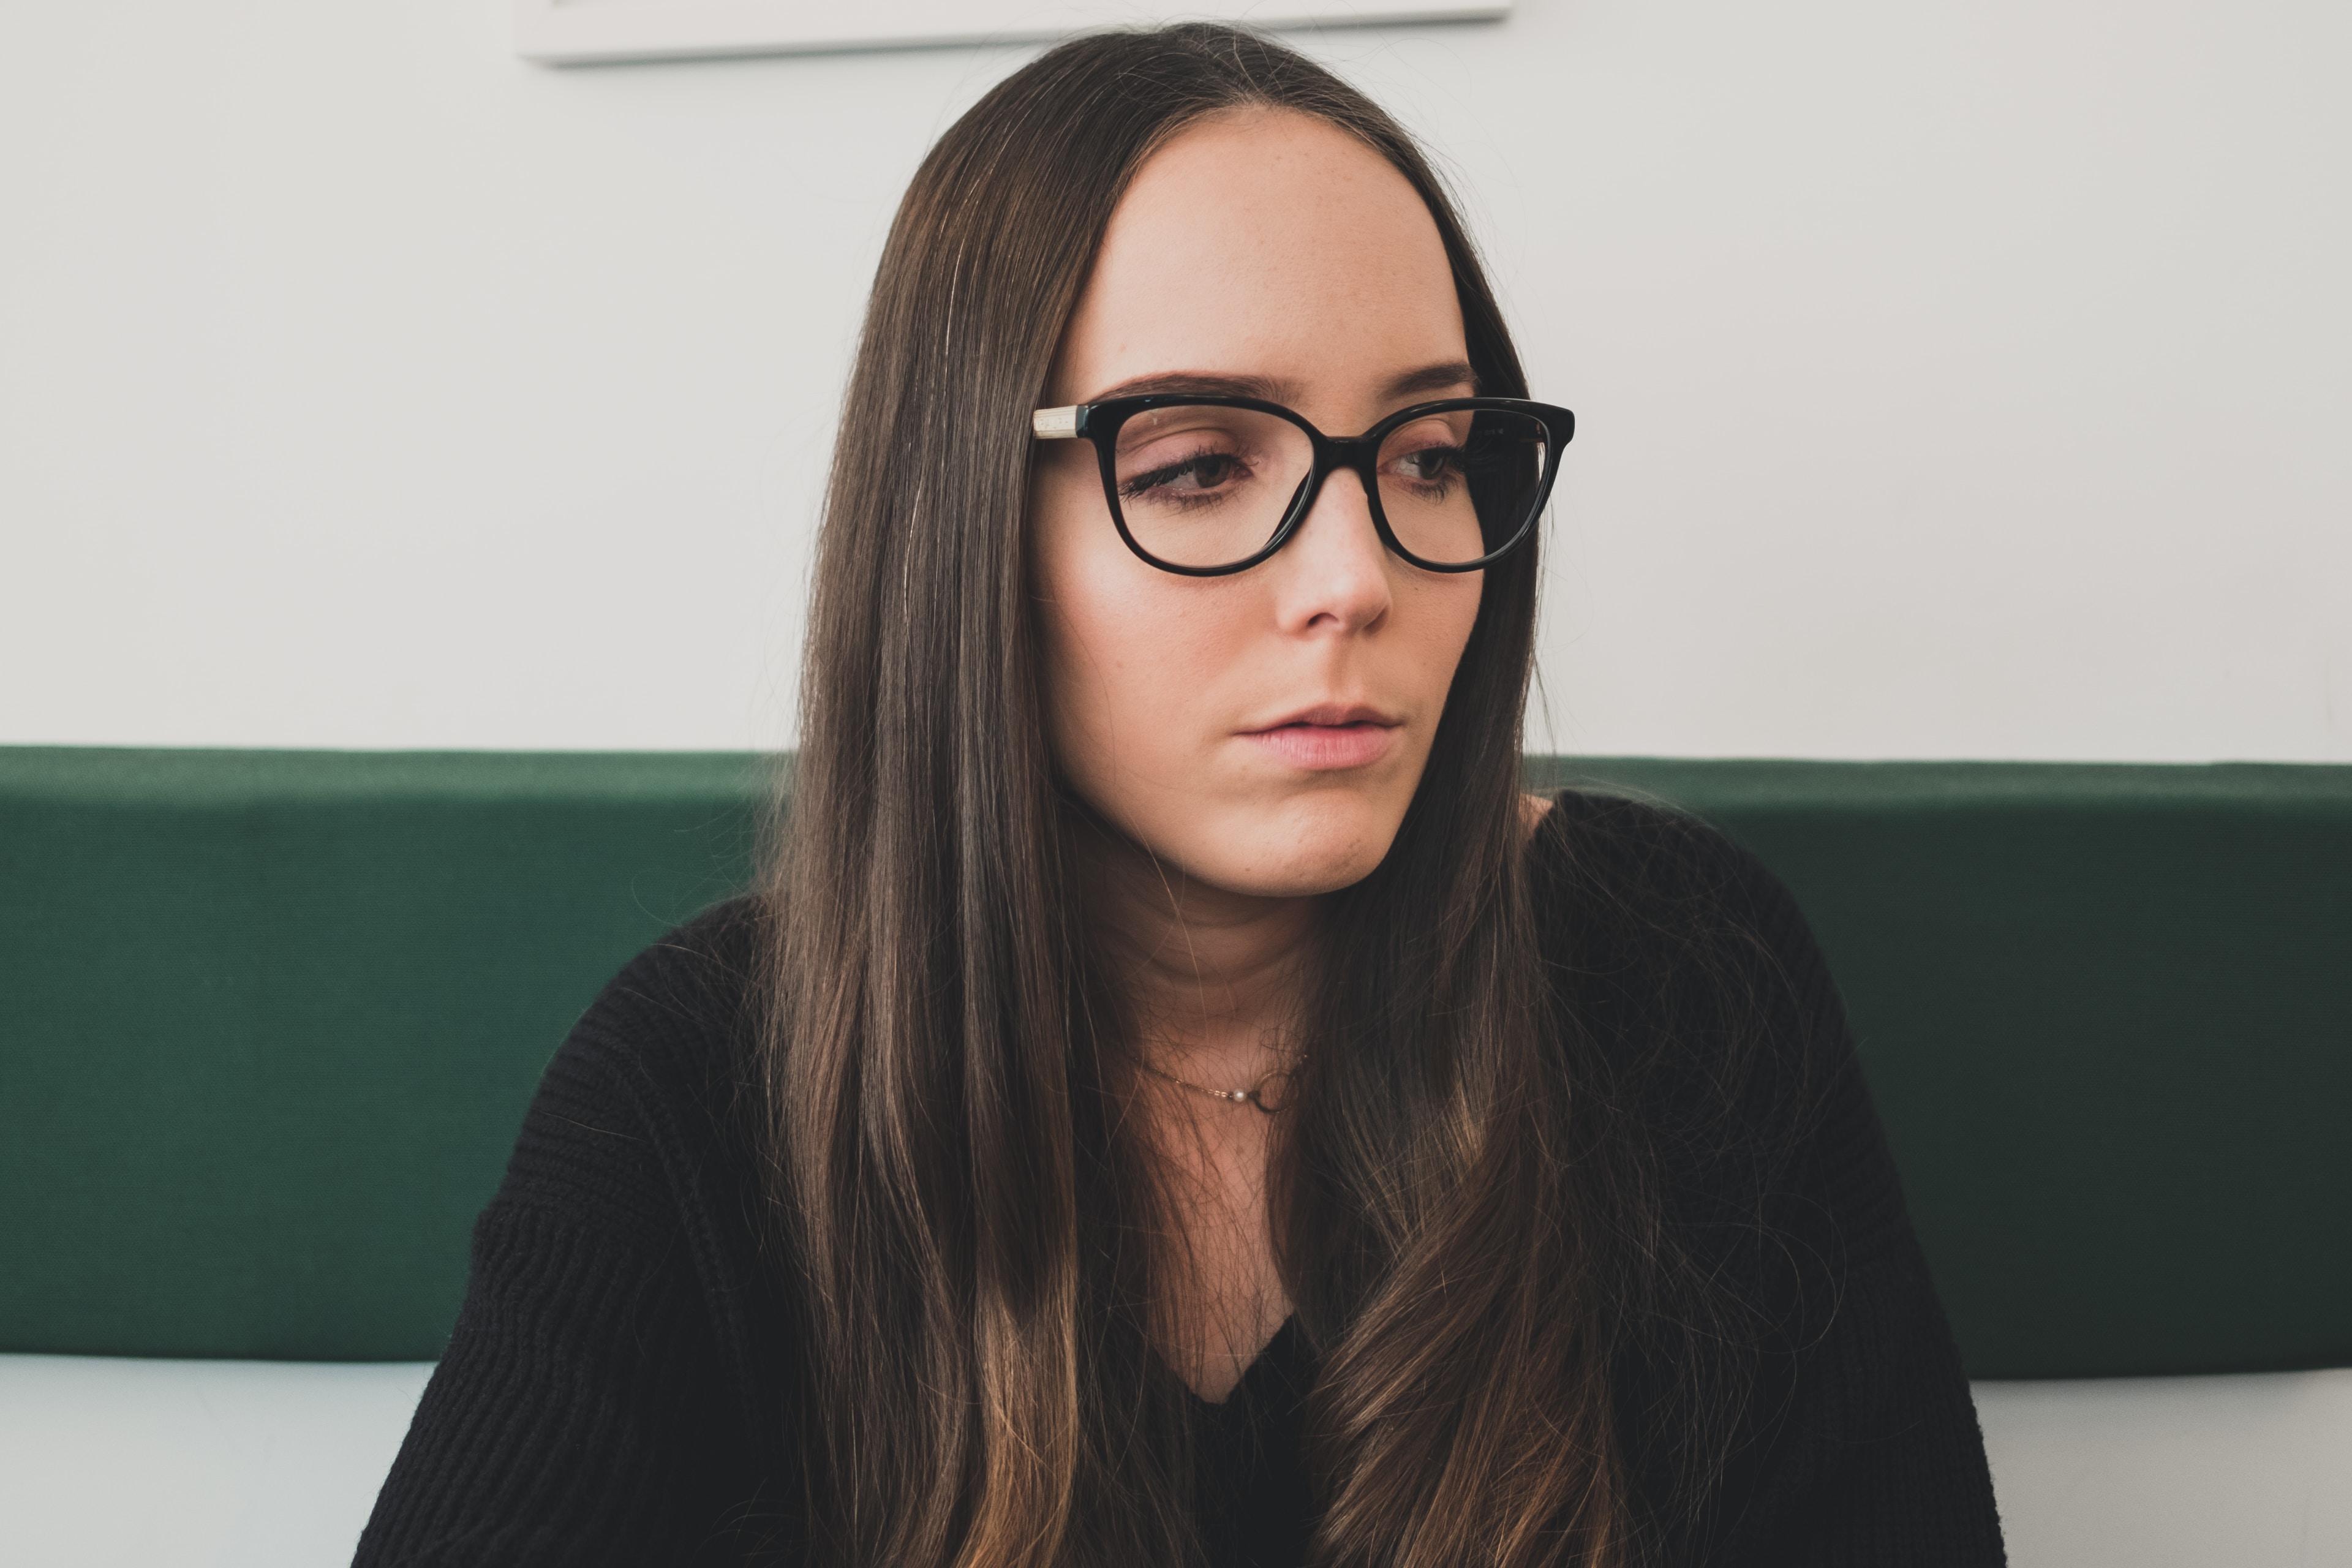 brunette haired woman in black shirt wearing eyeglasses